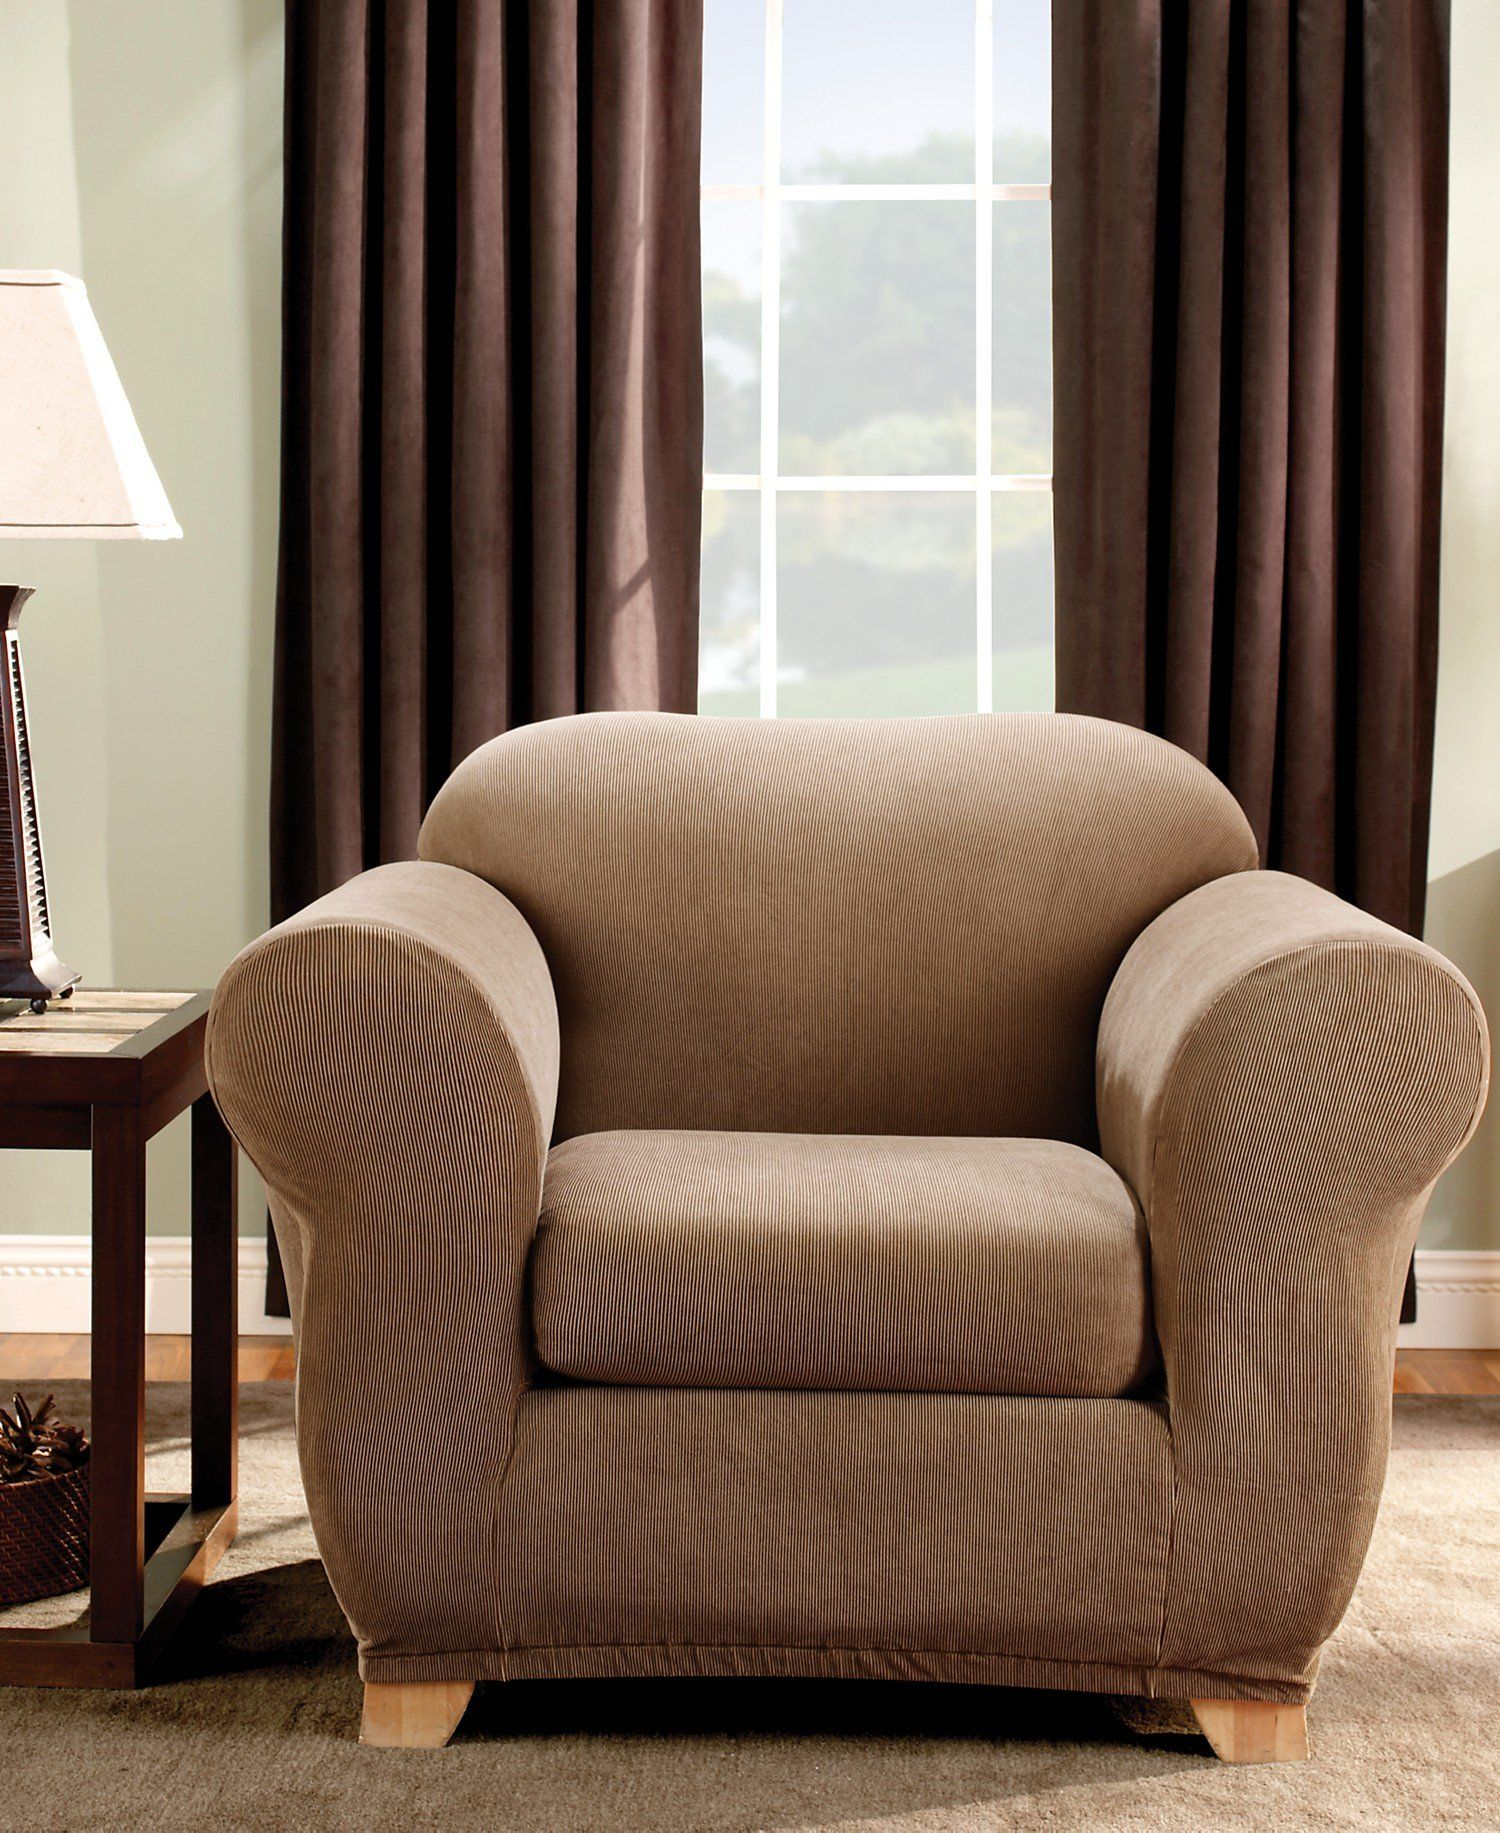 IKAYAA 7PCS Patio Garden Cushioned Furniture